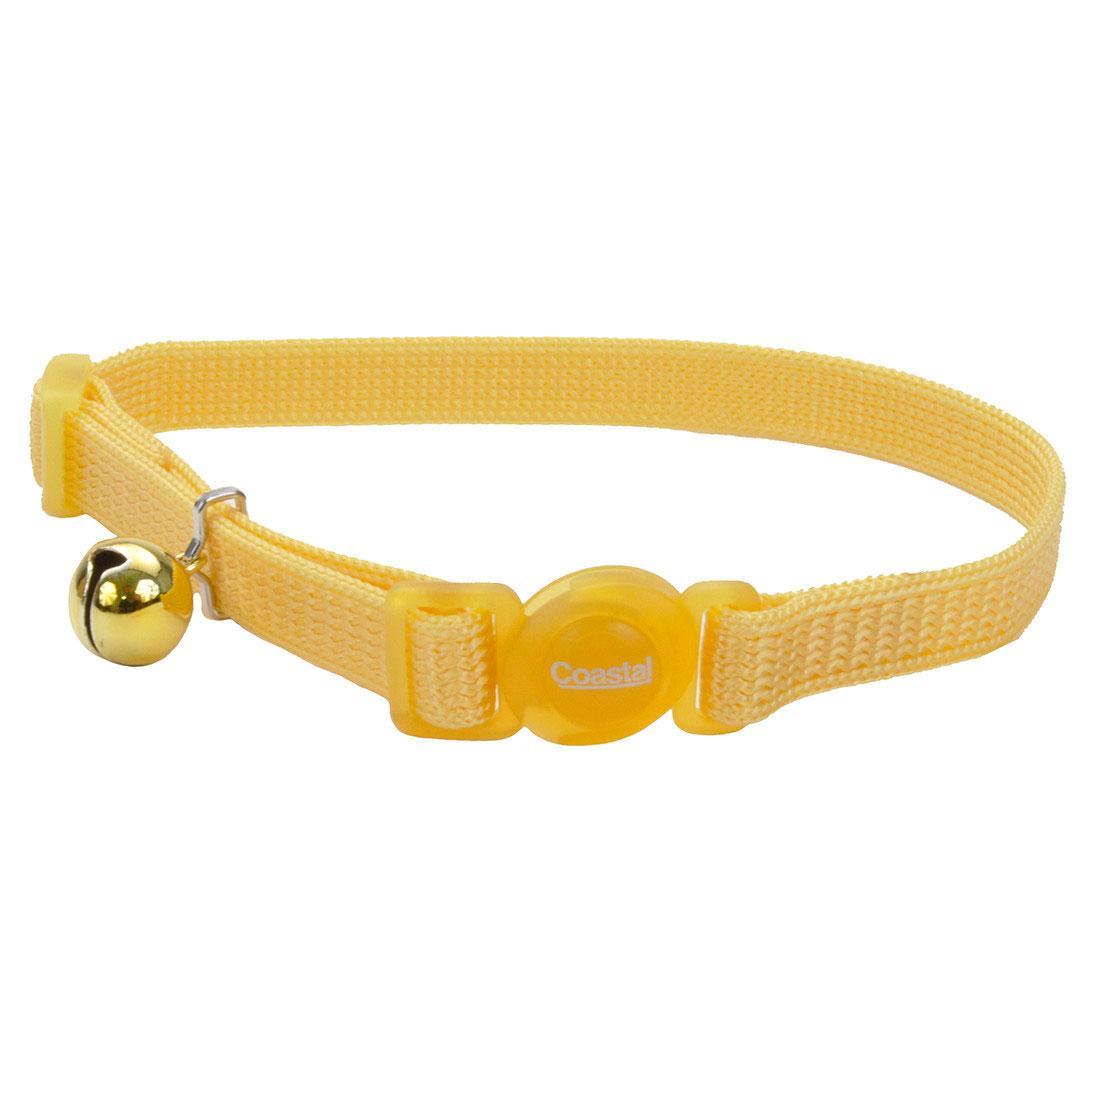 Safe Cat Adjustable Snag-Proof Breakaway Cat Collar, Banana Boat, 3/8-in x 8-12-in